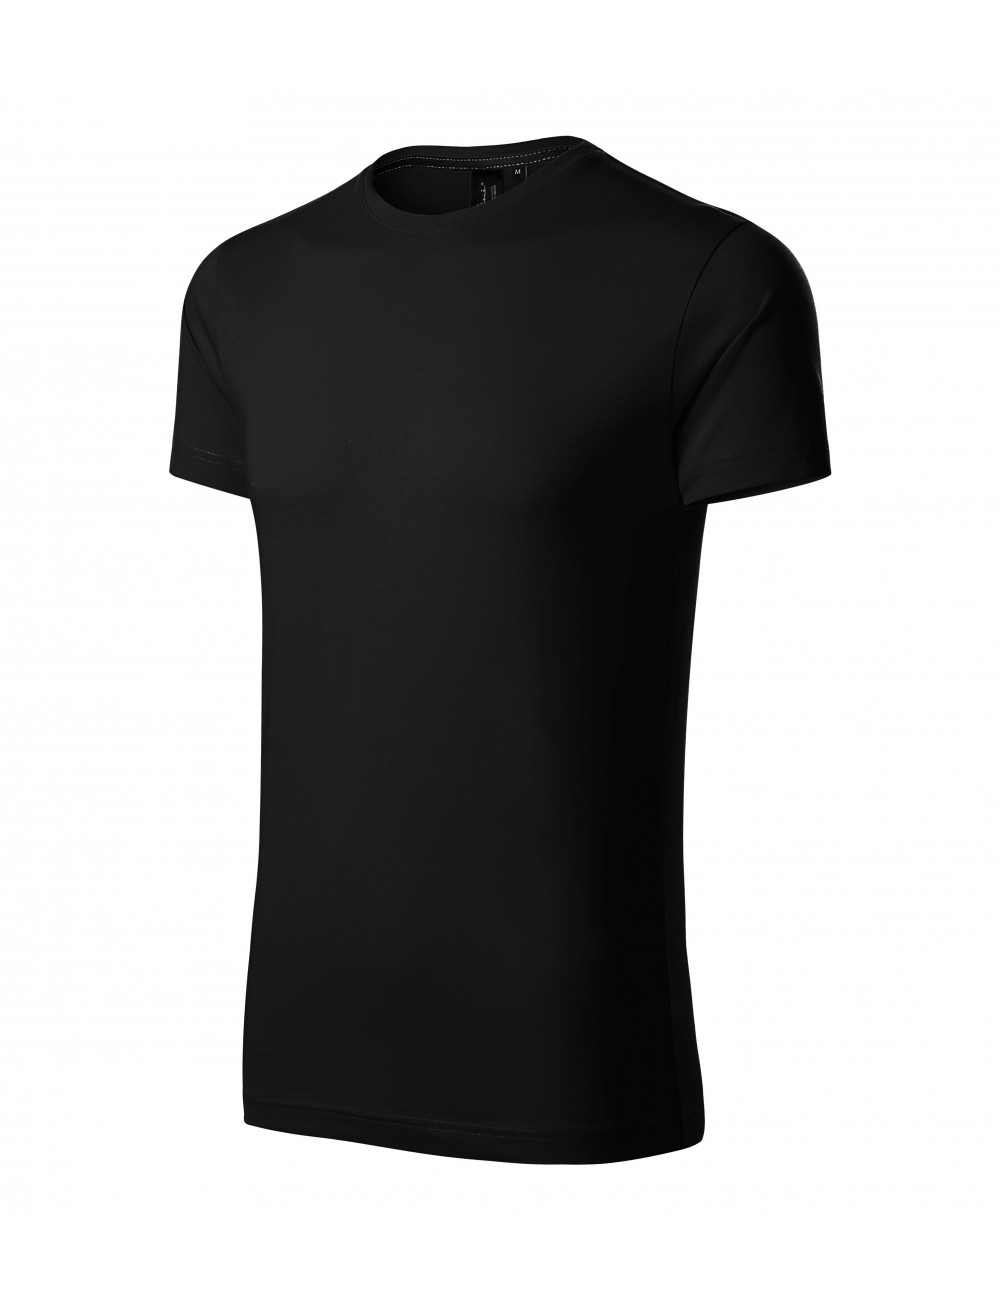 Adler MALFINIPREMIUM Koszulka męska Exclusive 153 czarny